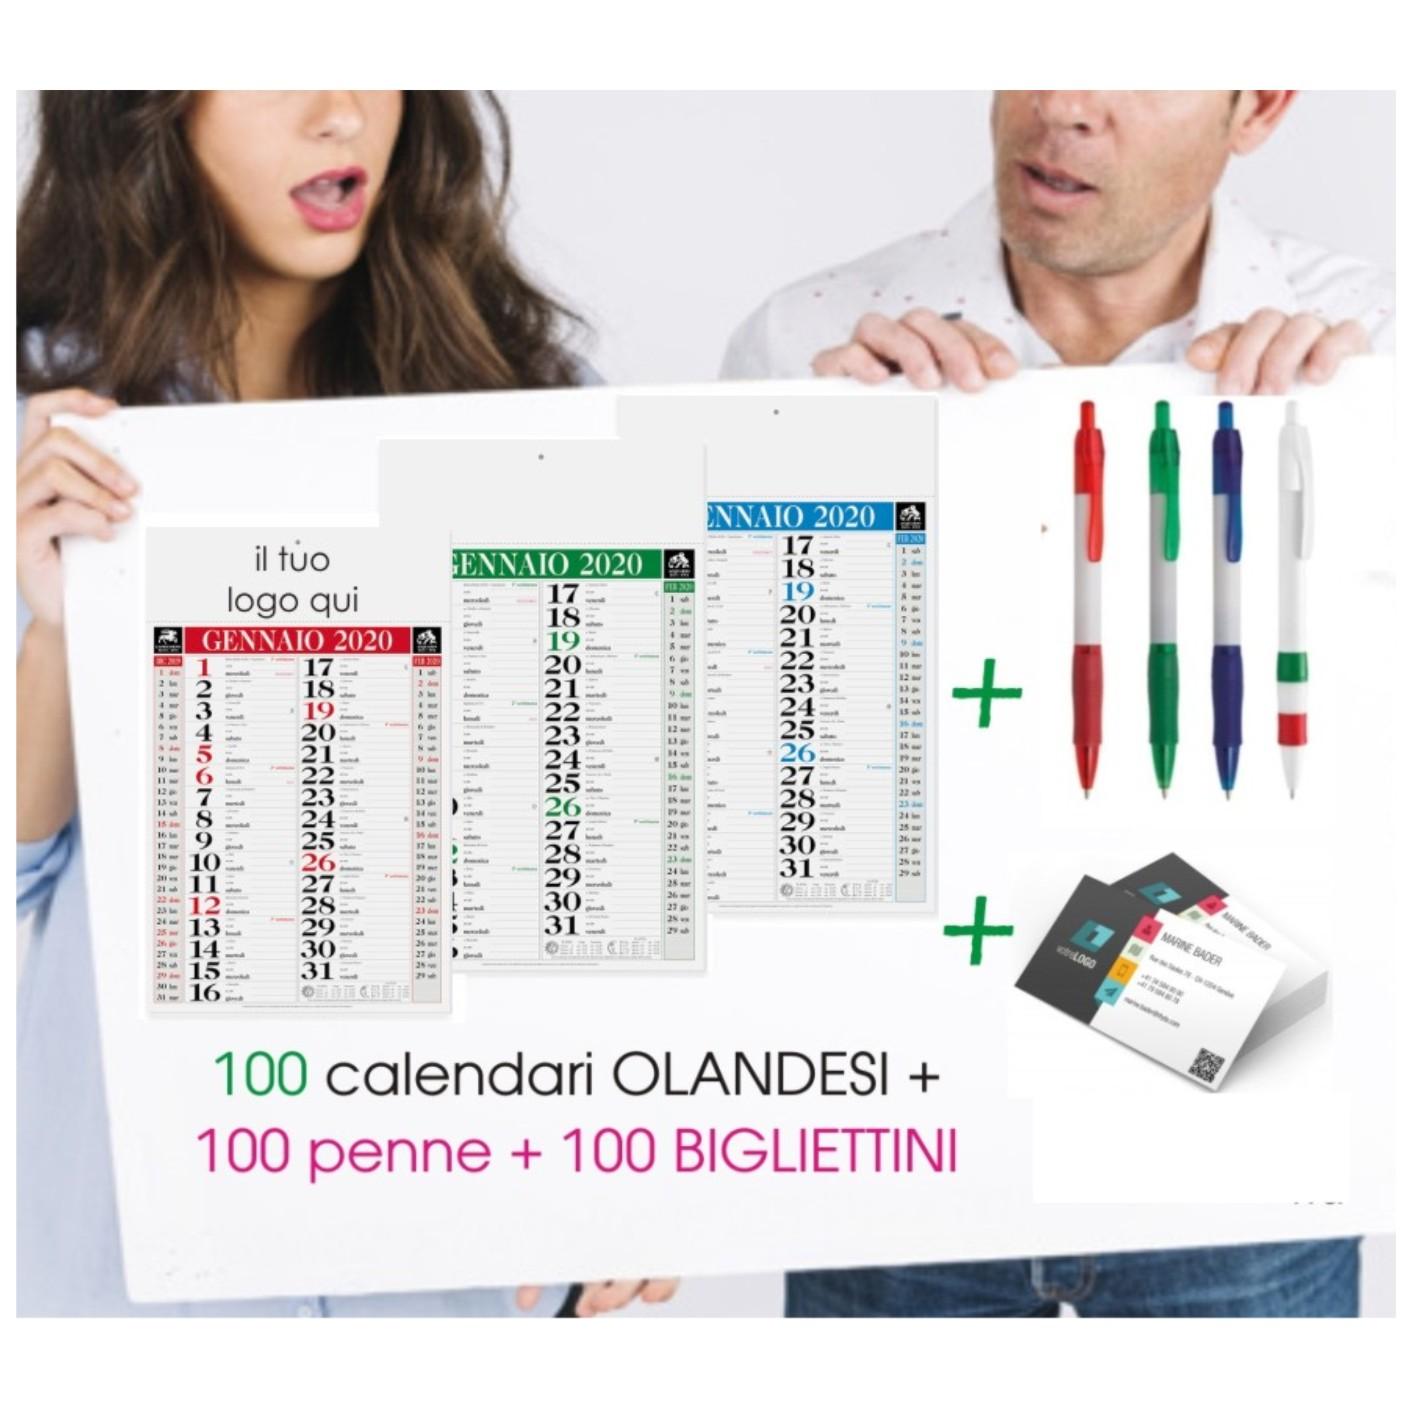 Vendita Calendario 2020.I Nostri Kit Gadget Pubblicitari 100 Calendari 100 Penne 100 Bigliettini